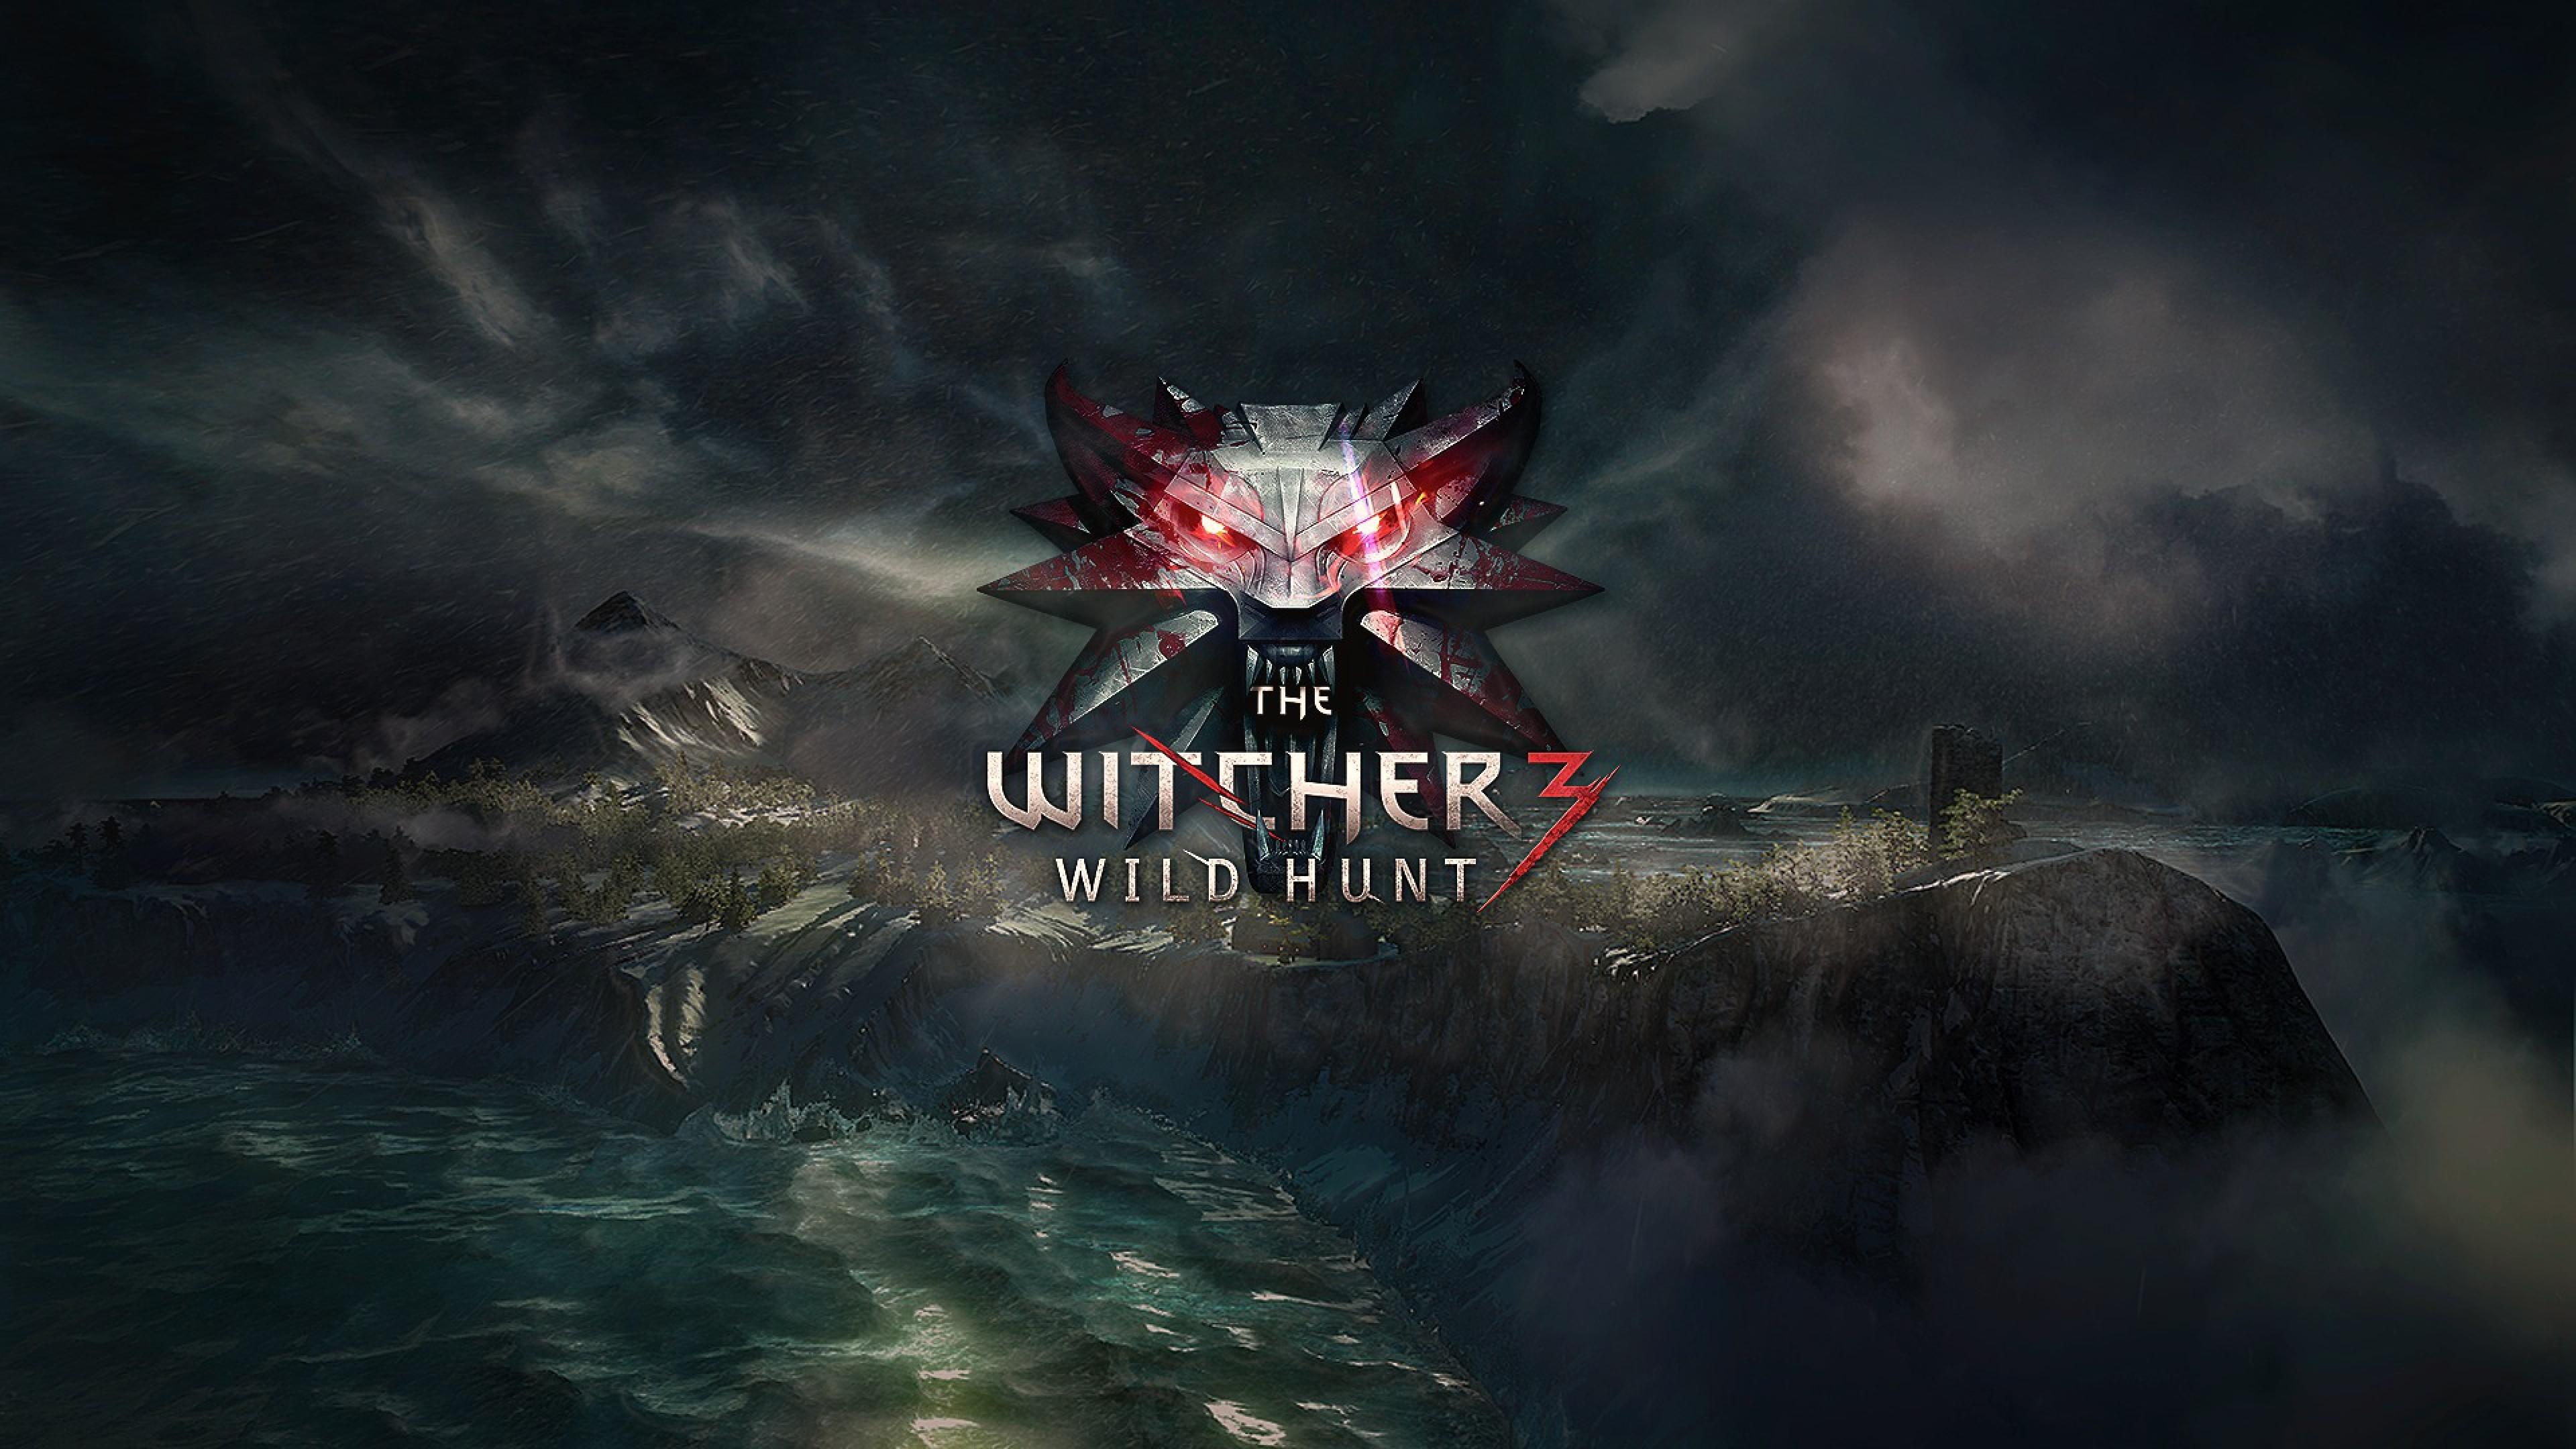 Wallpaper the witcher 3, wild hunt, logo